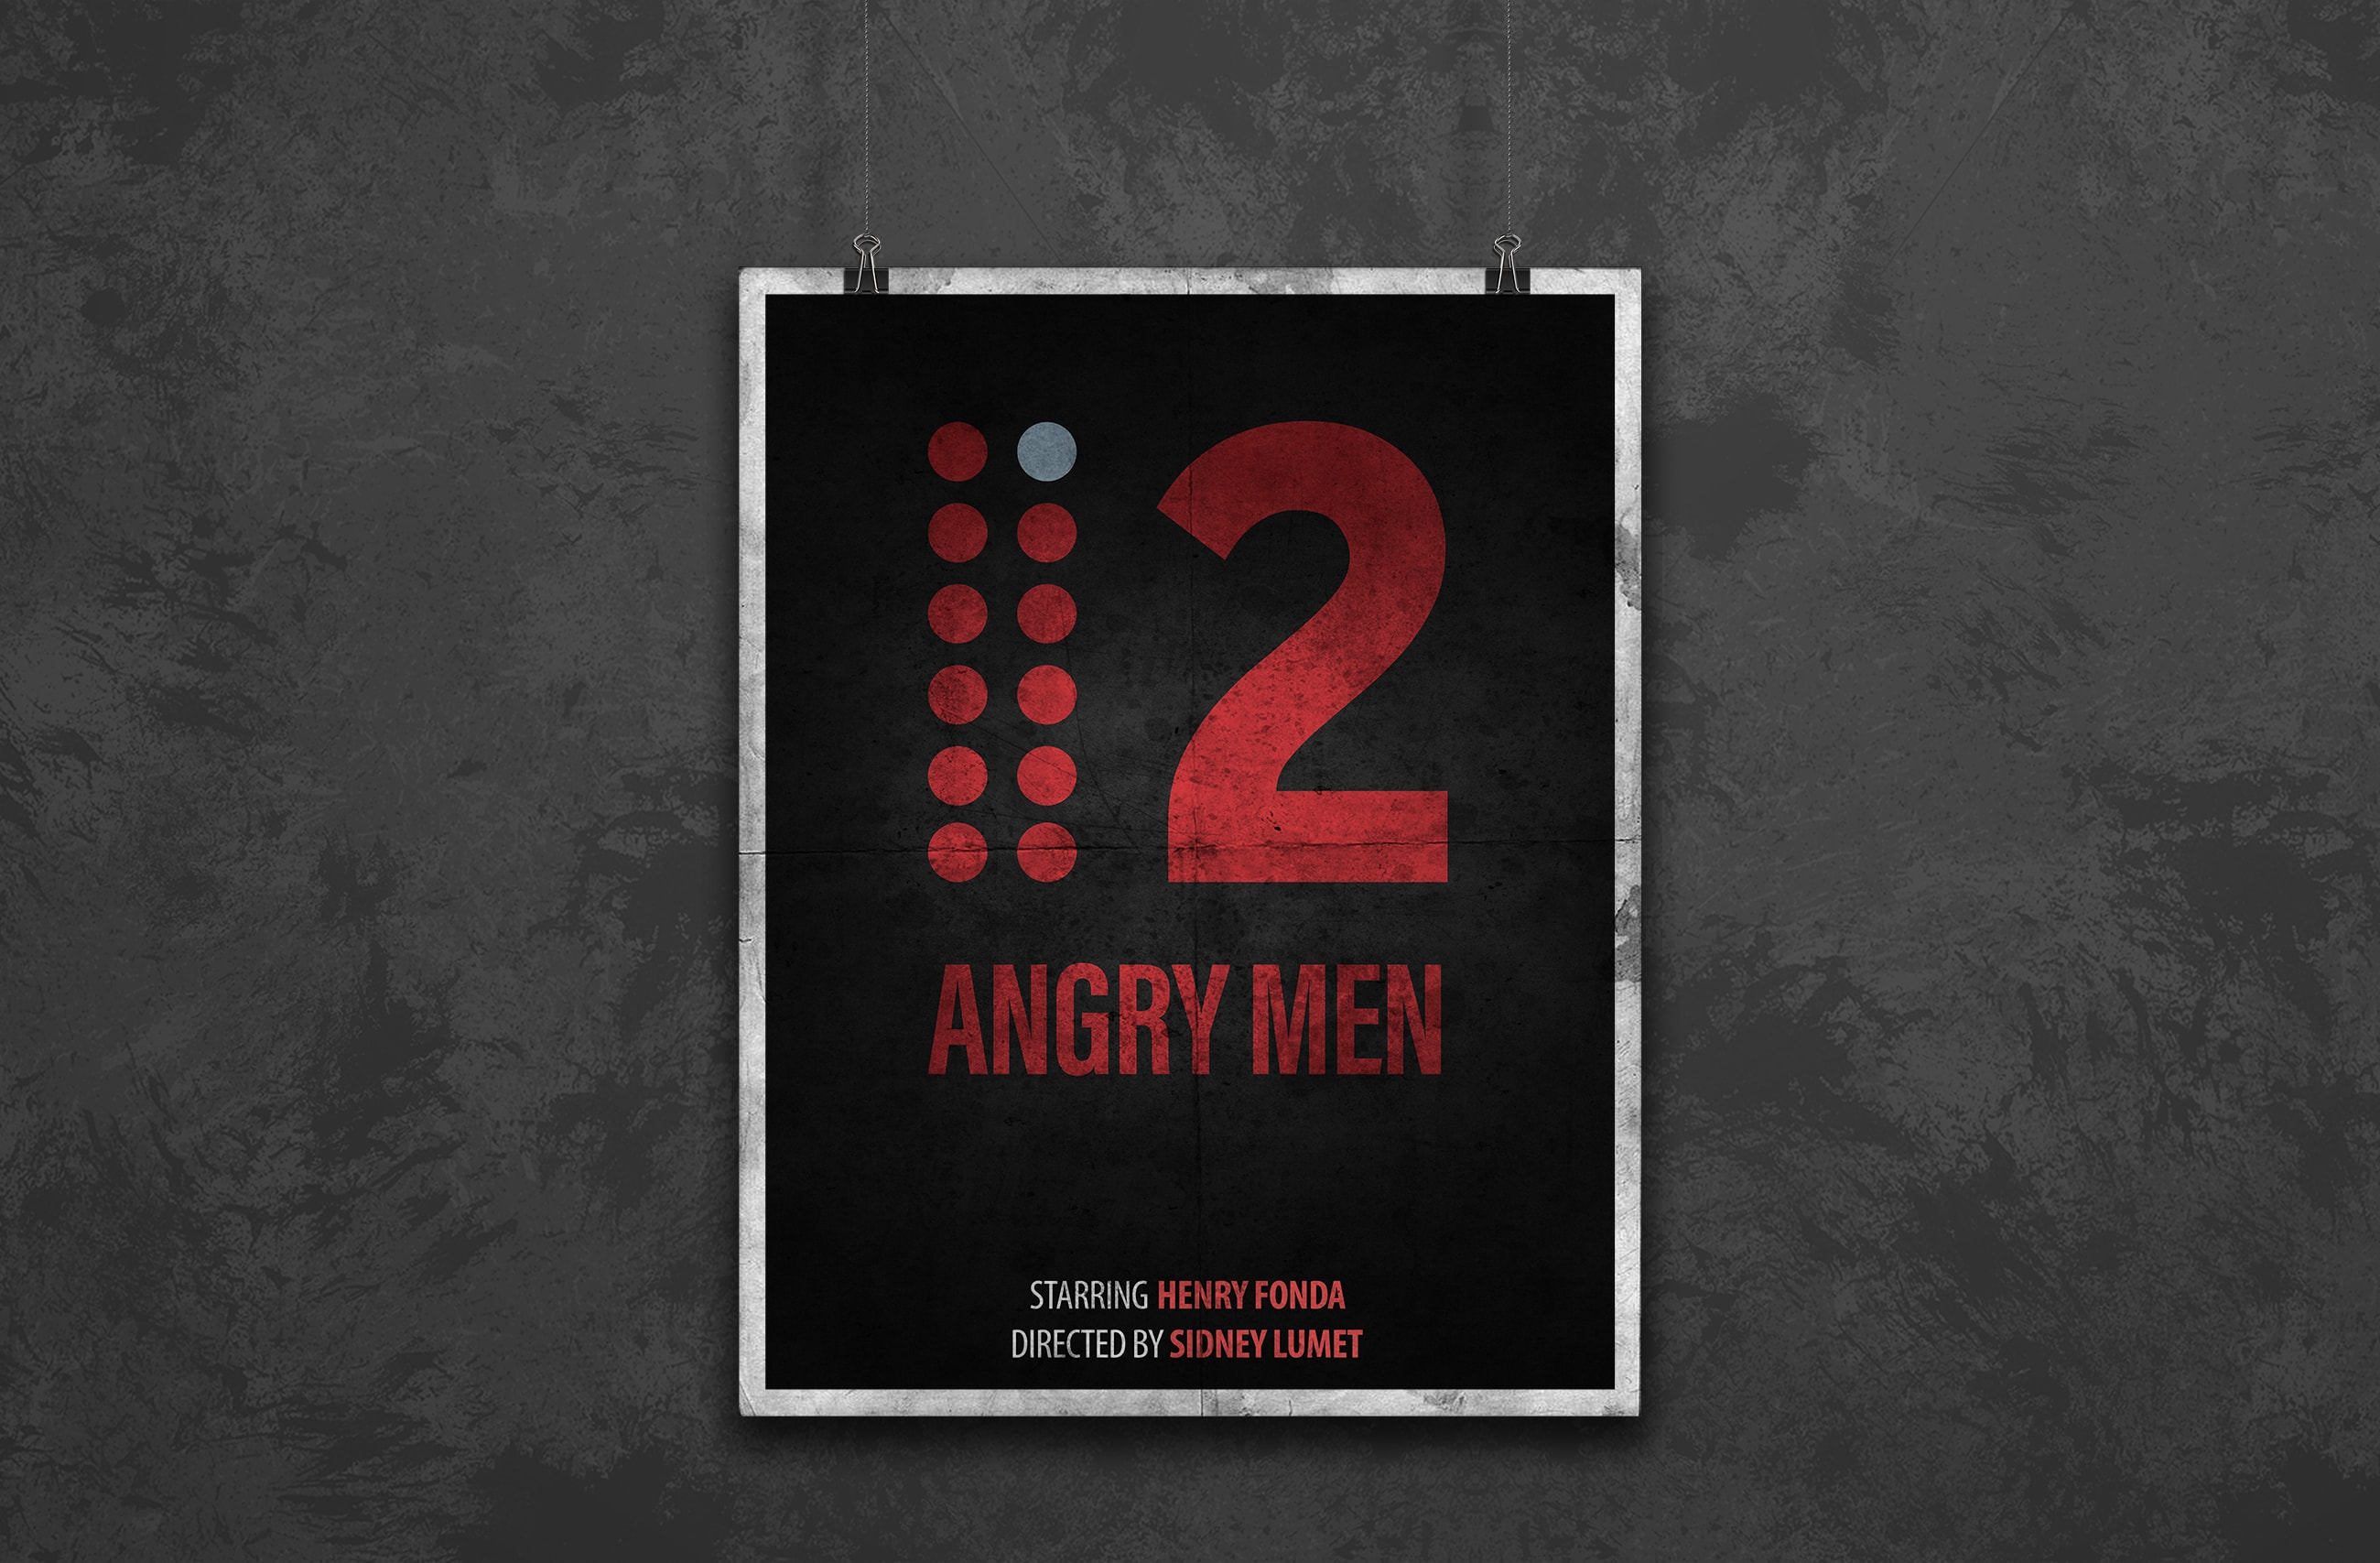 12 angry men minimal poster design